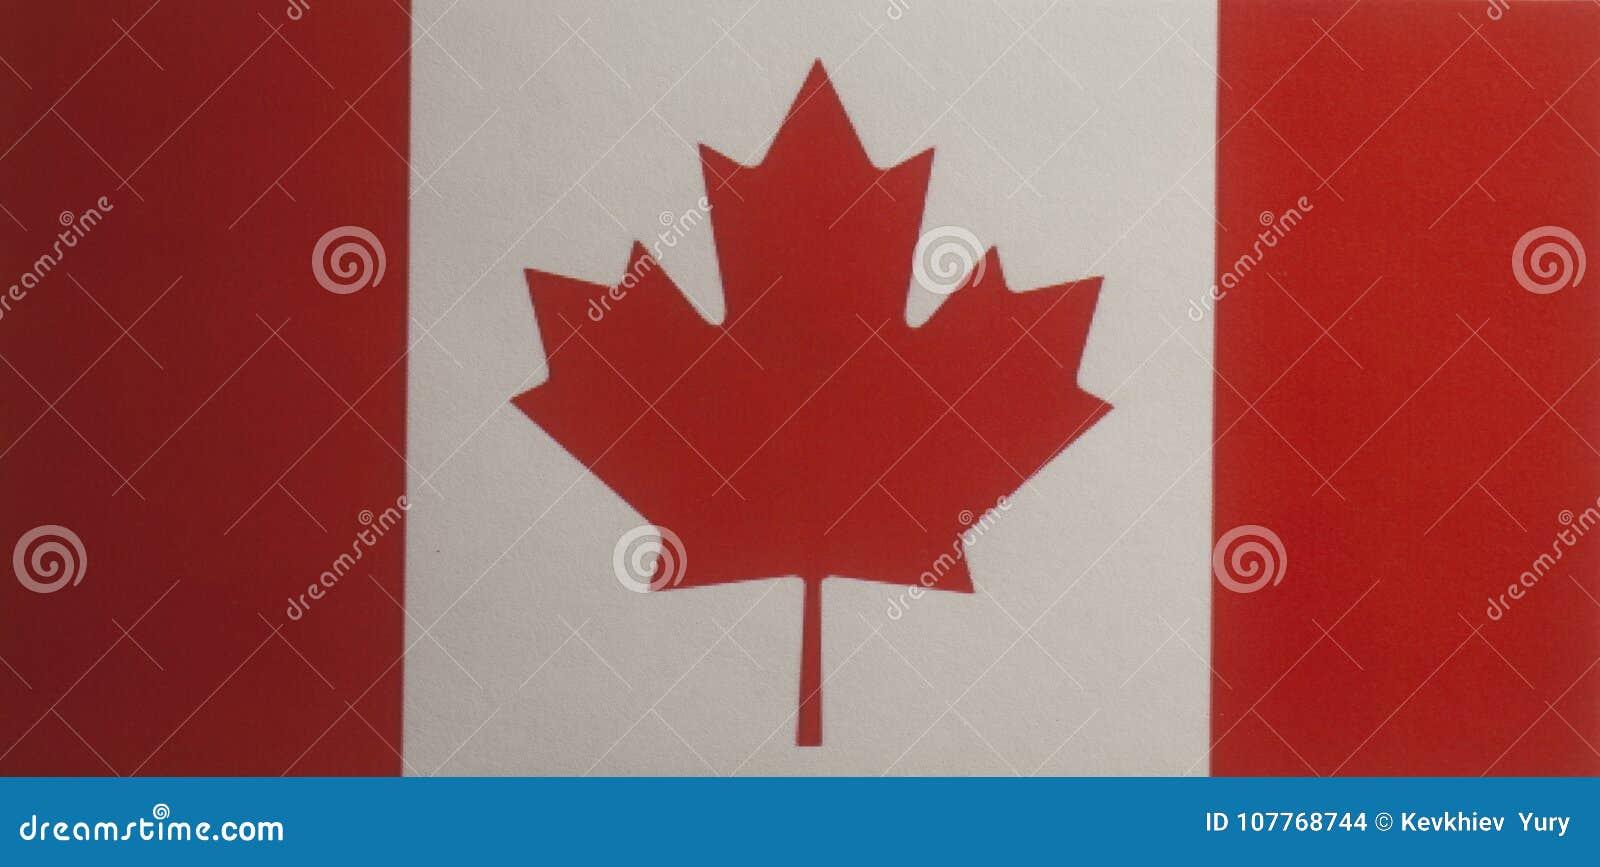 Flag Of Canada Stock Photo Image Of Folds Design Canadian 107768744